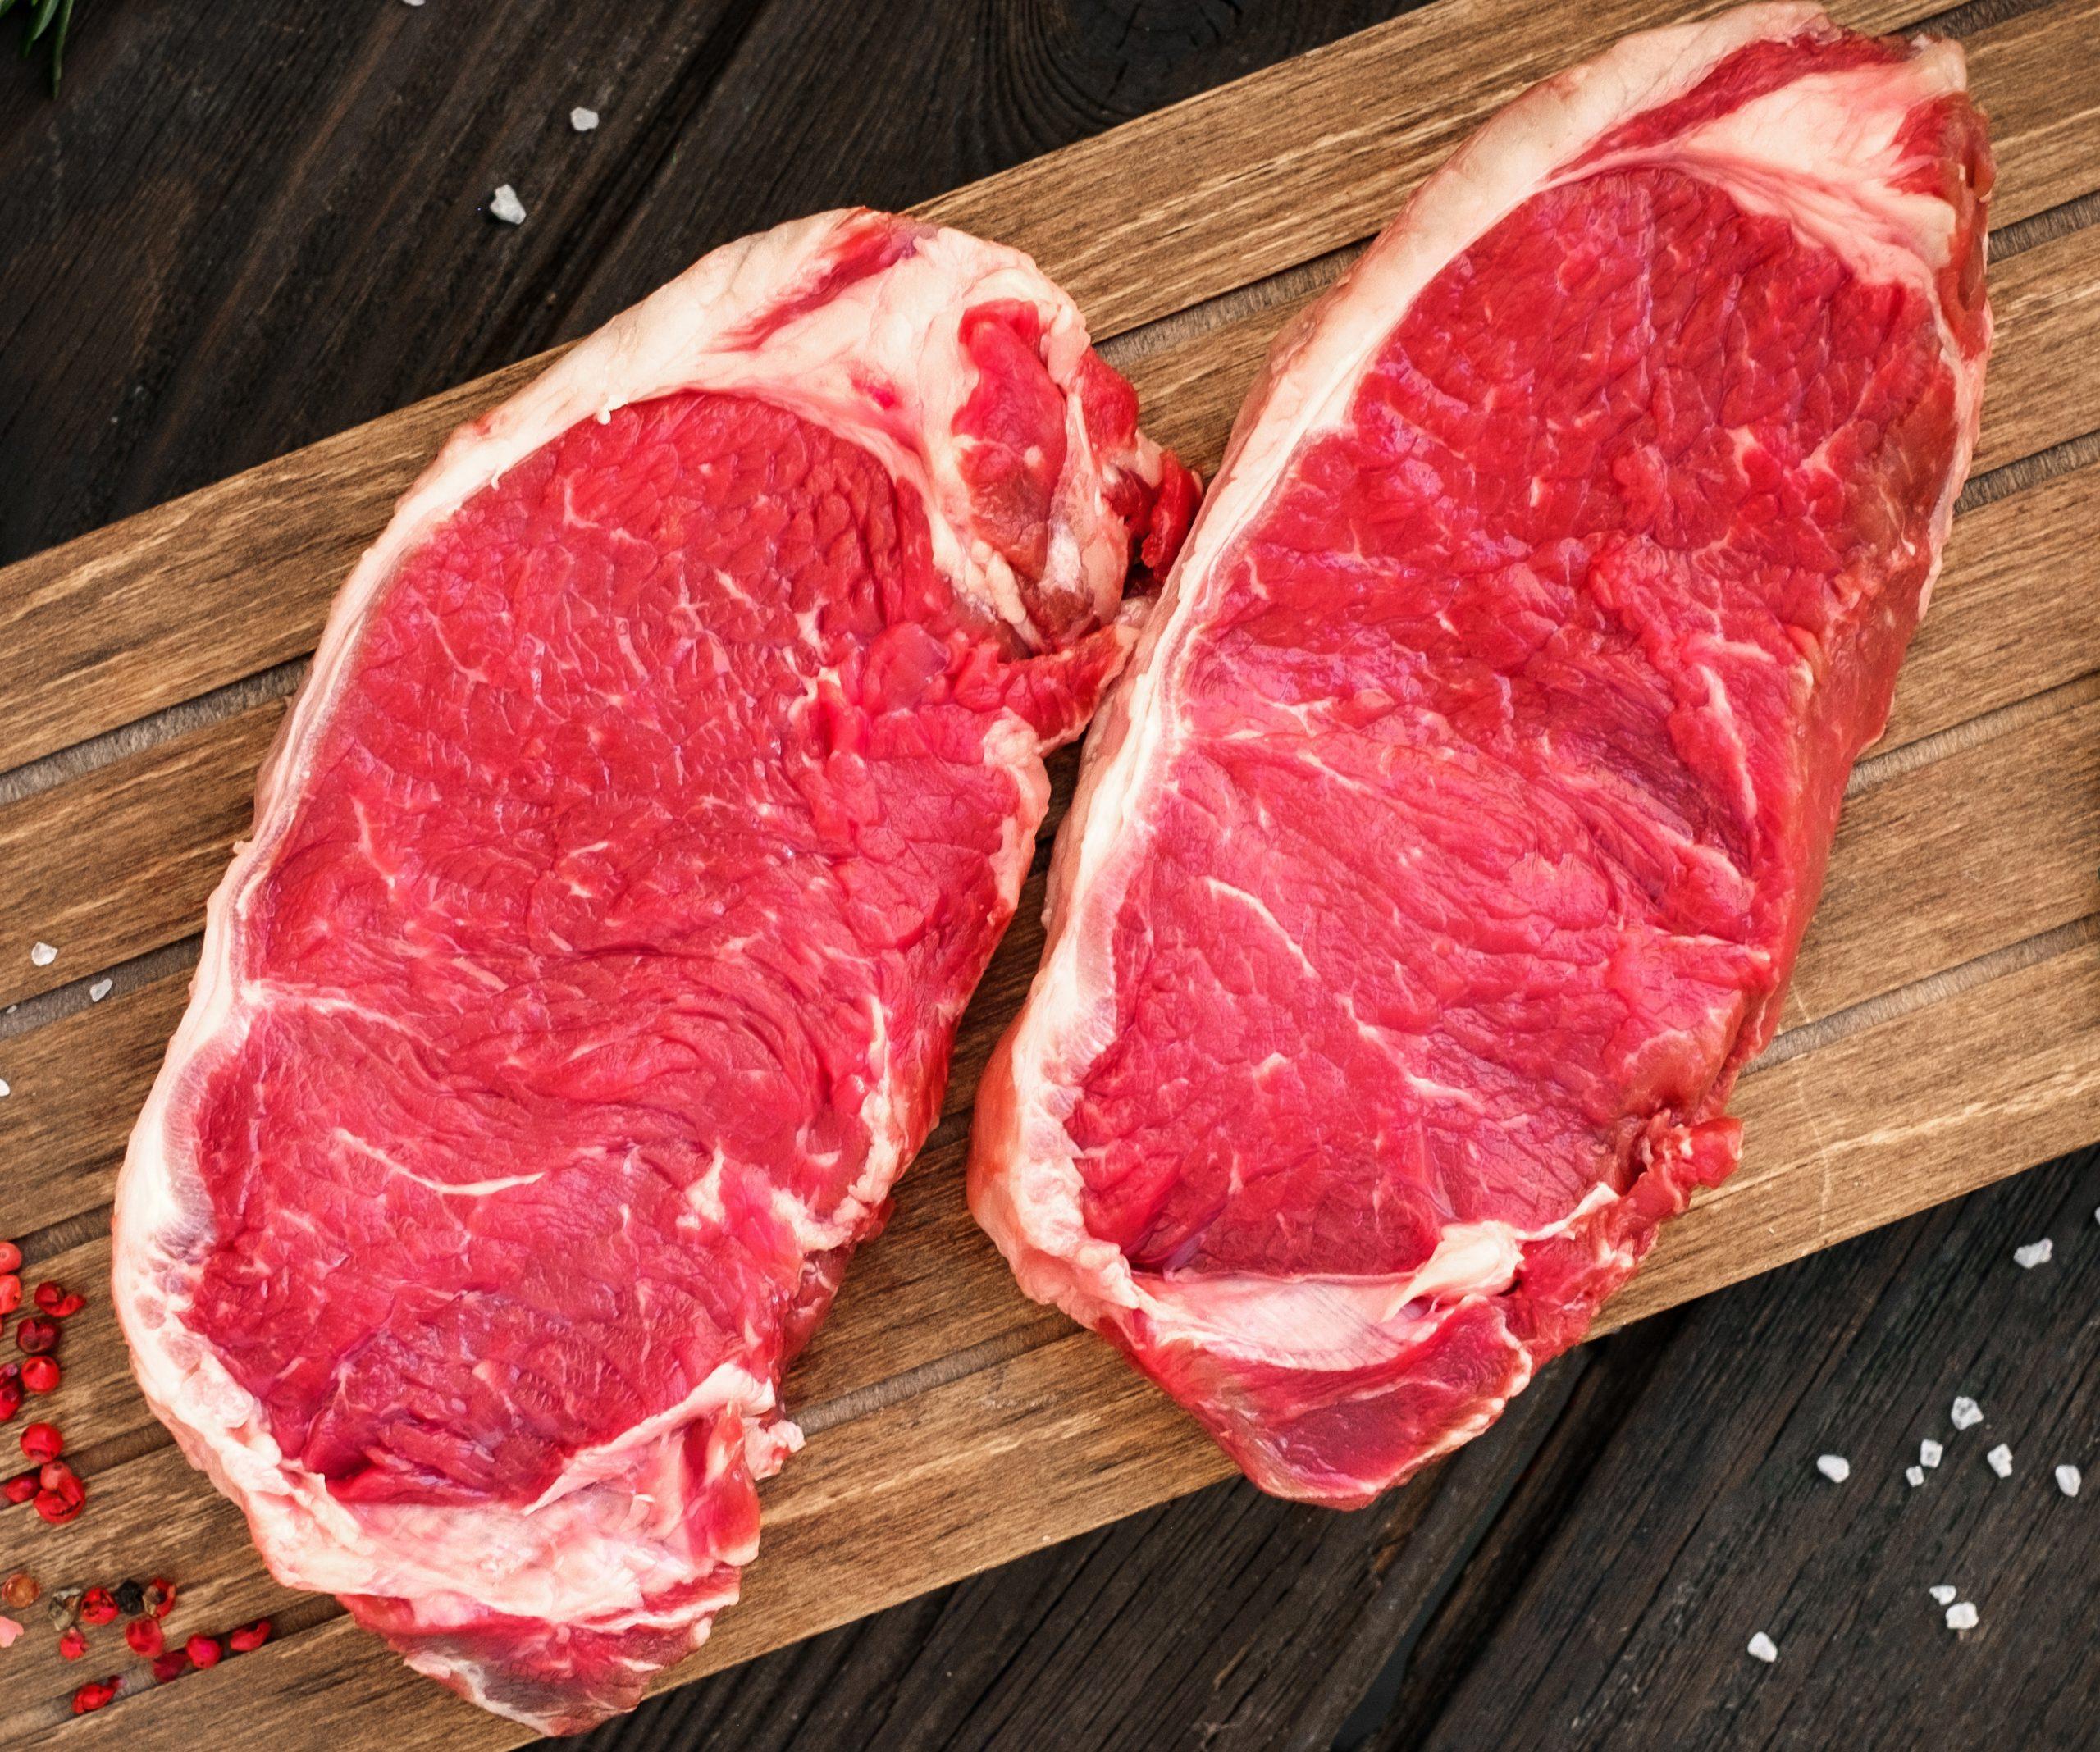 Top Sirloin steak raw